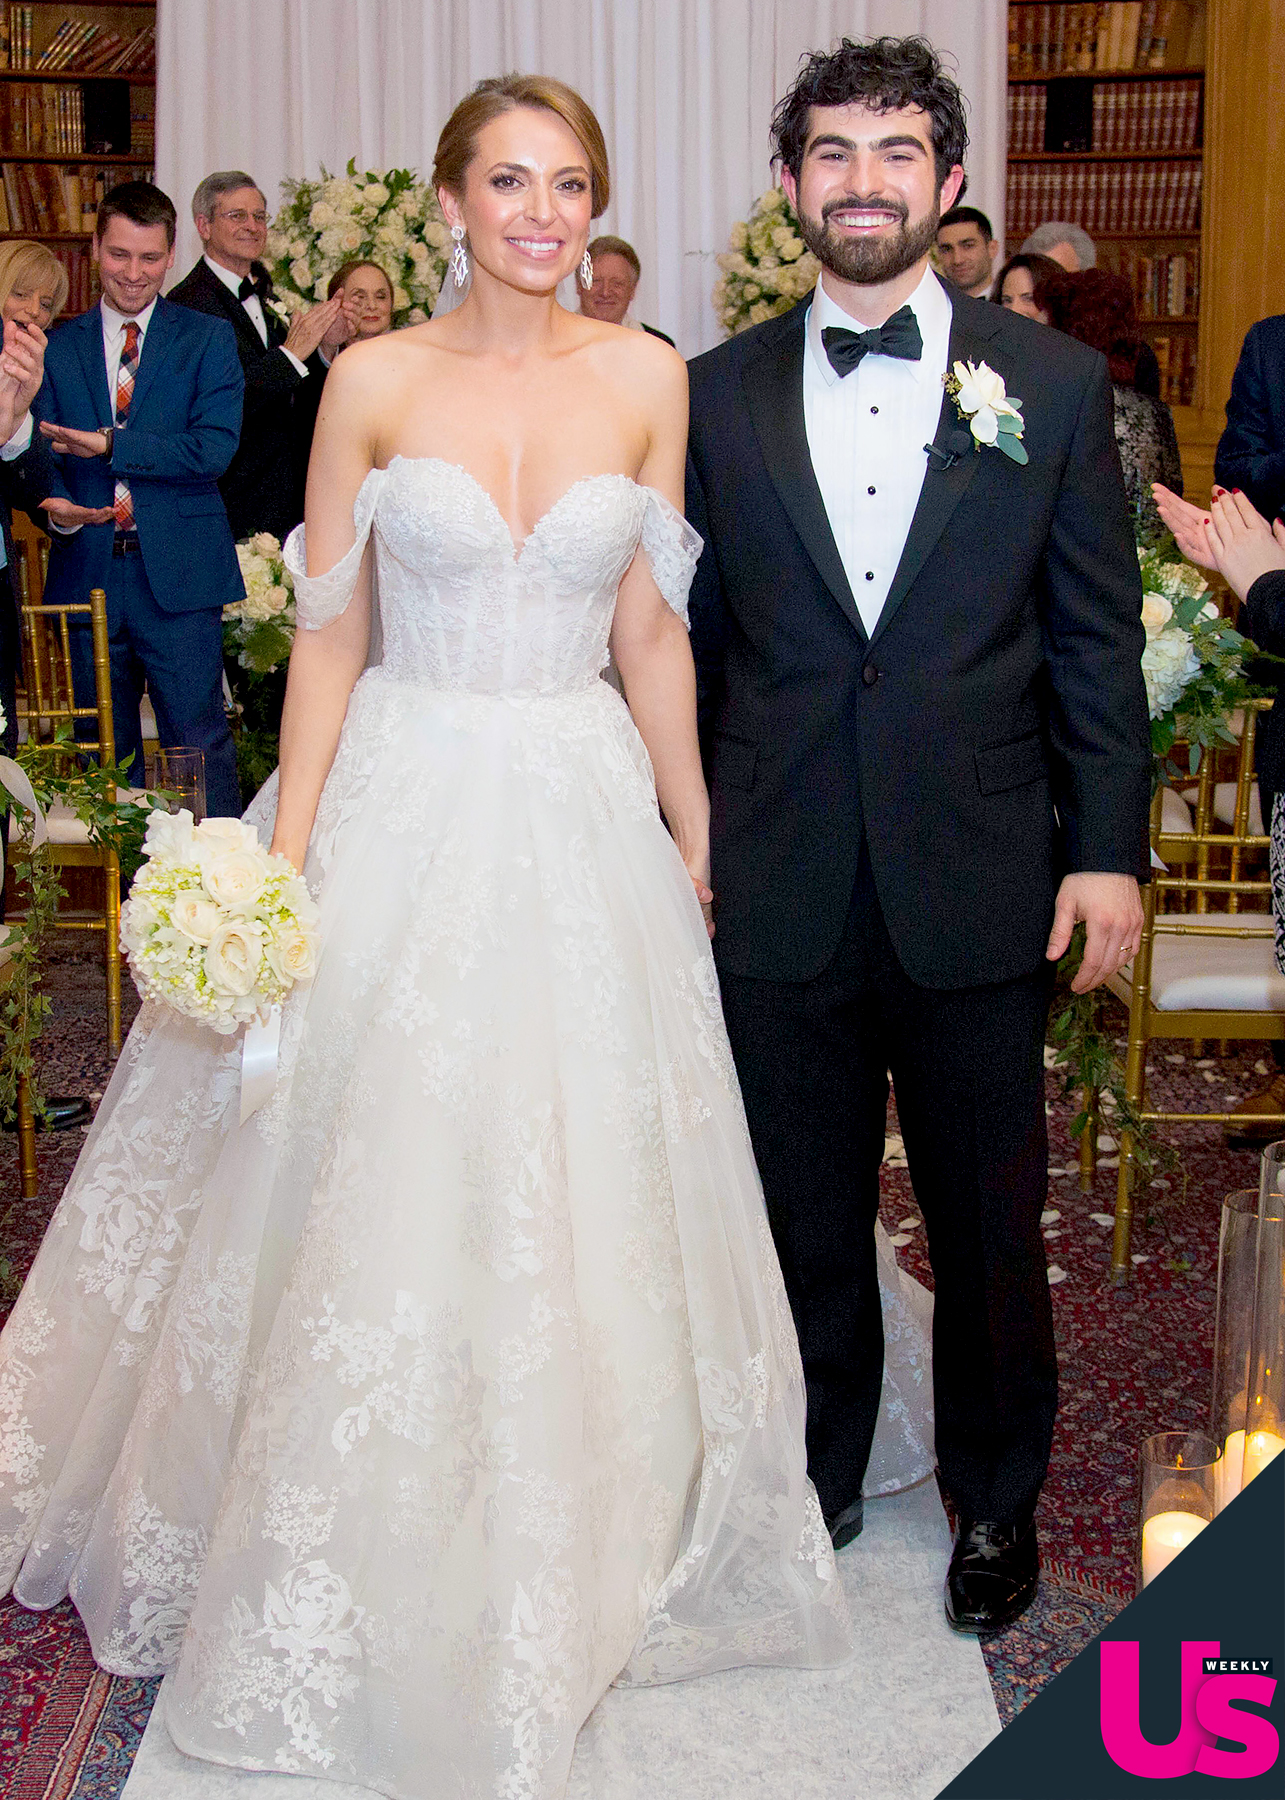 Marisha Ray Wedding.Jedediah Bila Wedding Aidainternational Nl